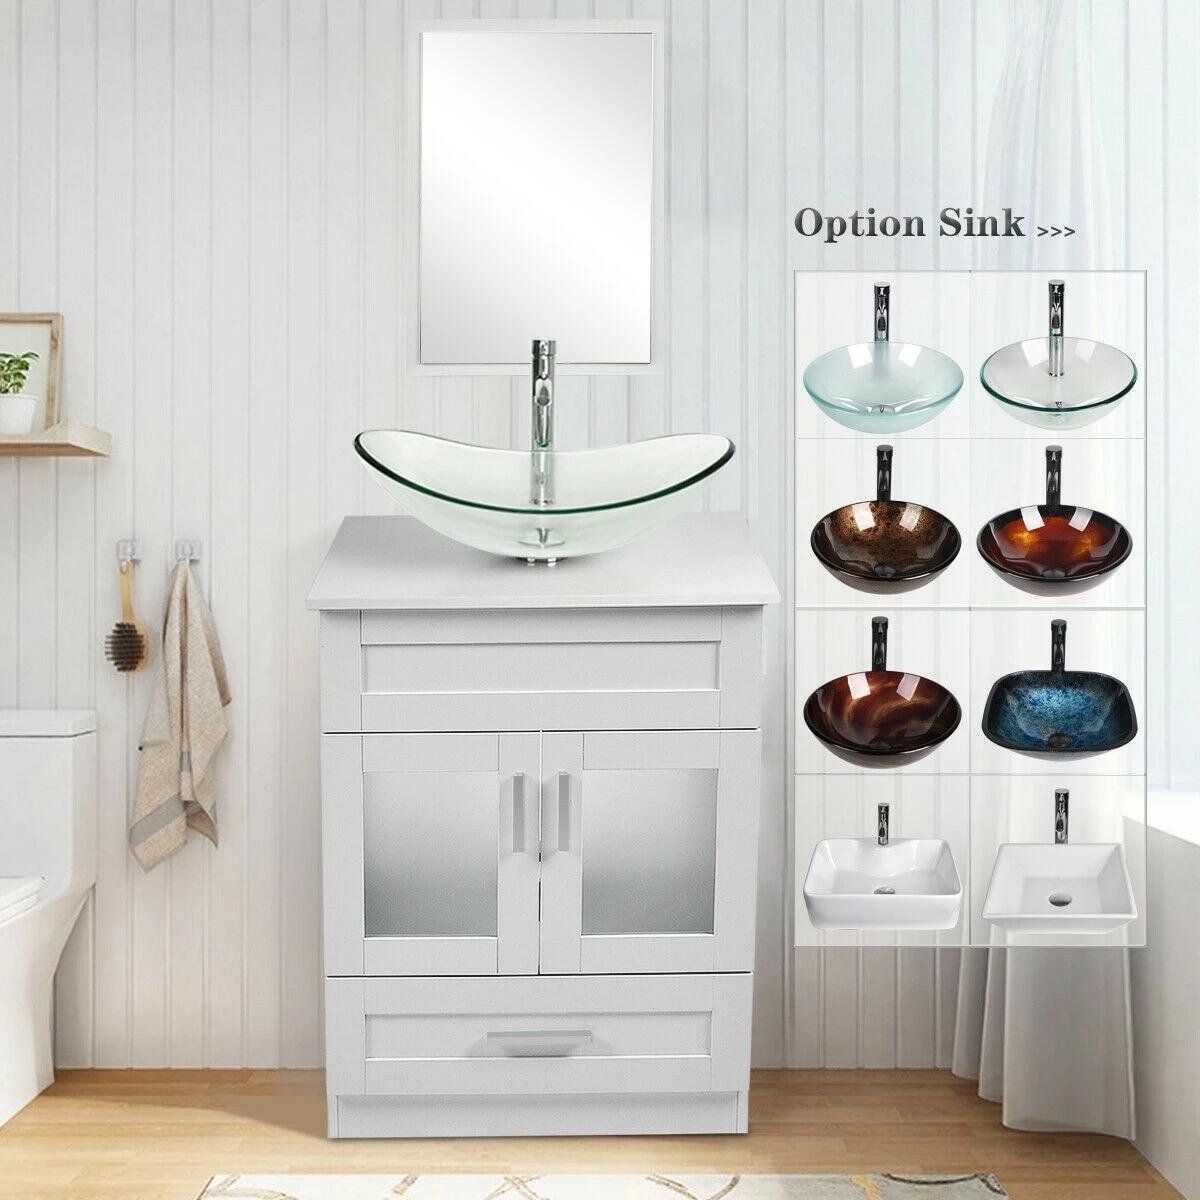 Bathroom Vanity 24 Inch White Cabinet Single Top Vessel Sink Faucet Drain Combo Set Aliexpress